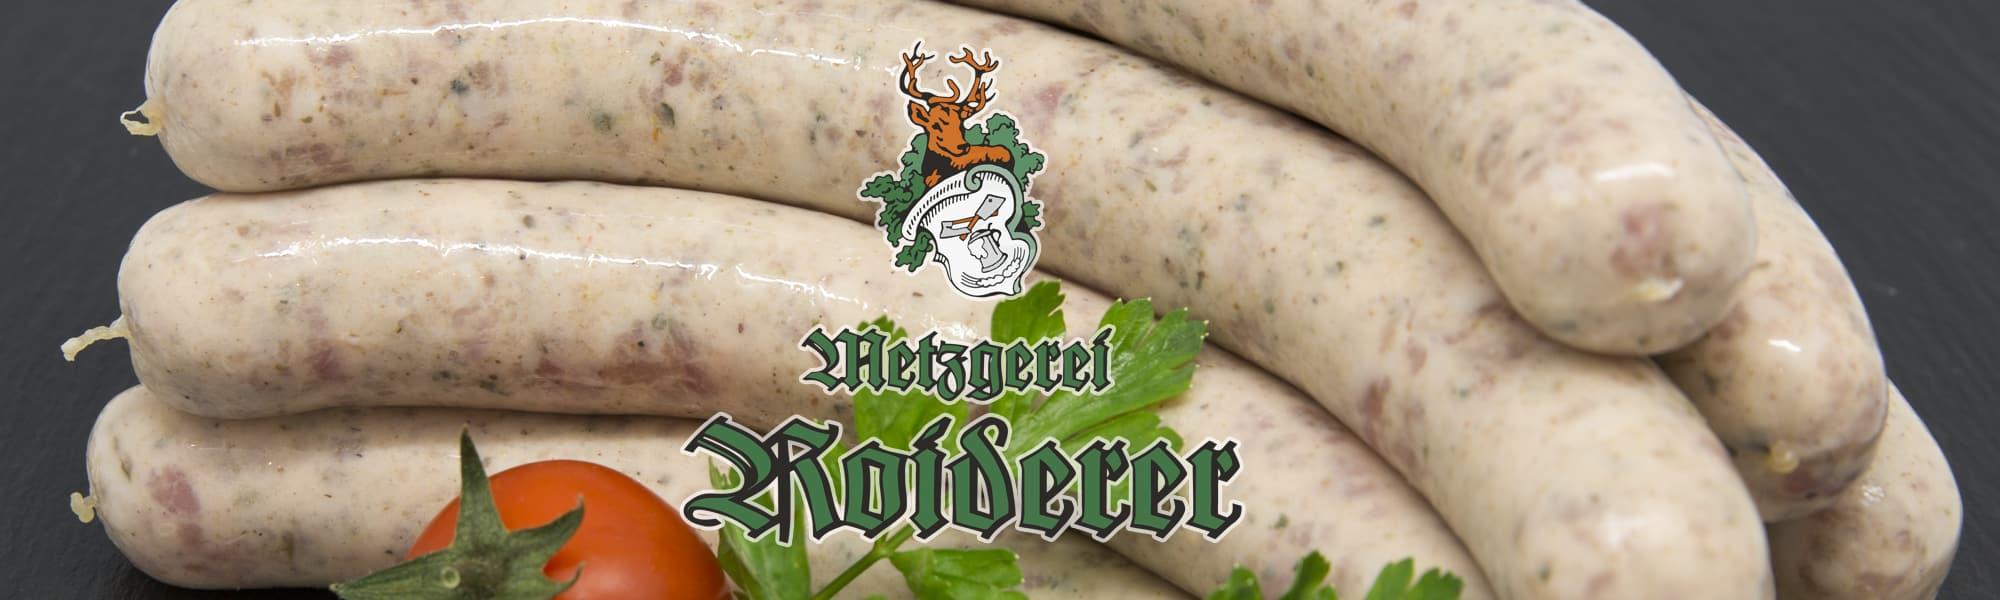 metzgerei-roiderer-01